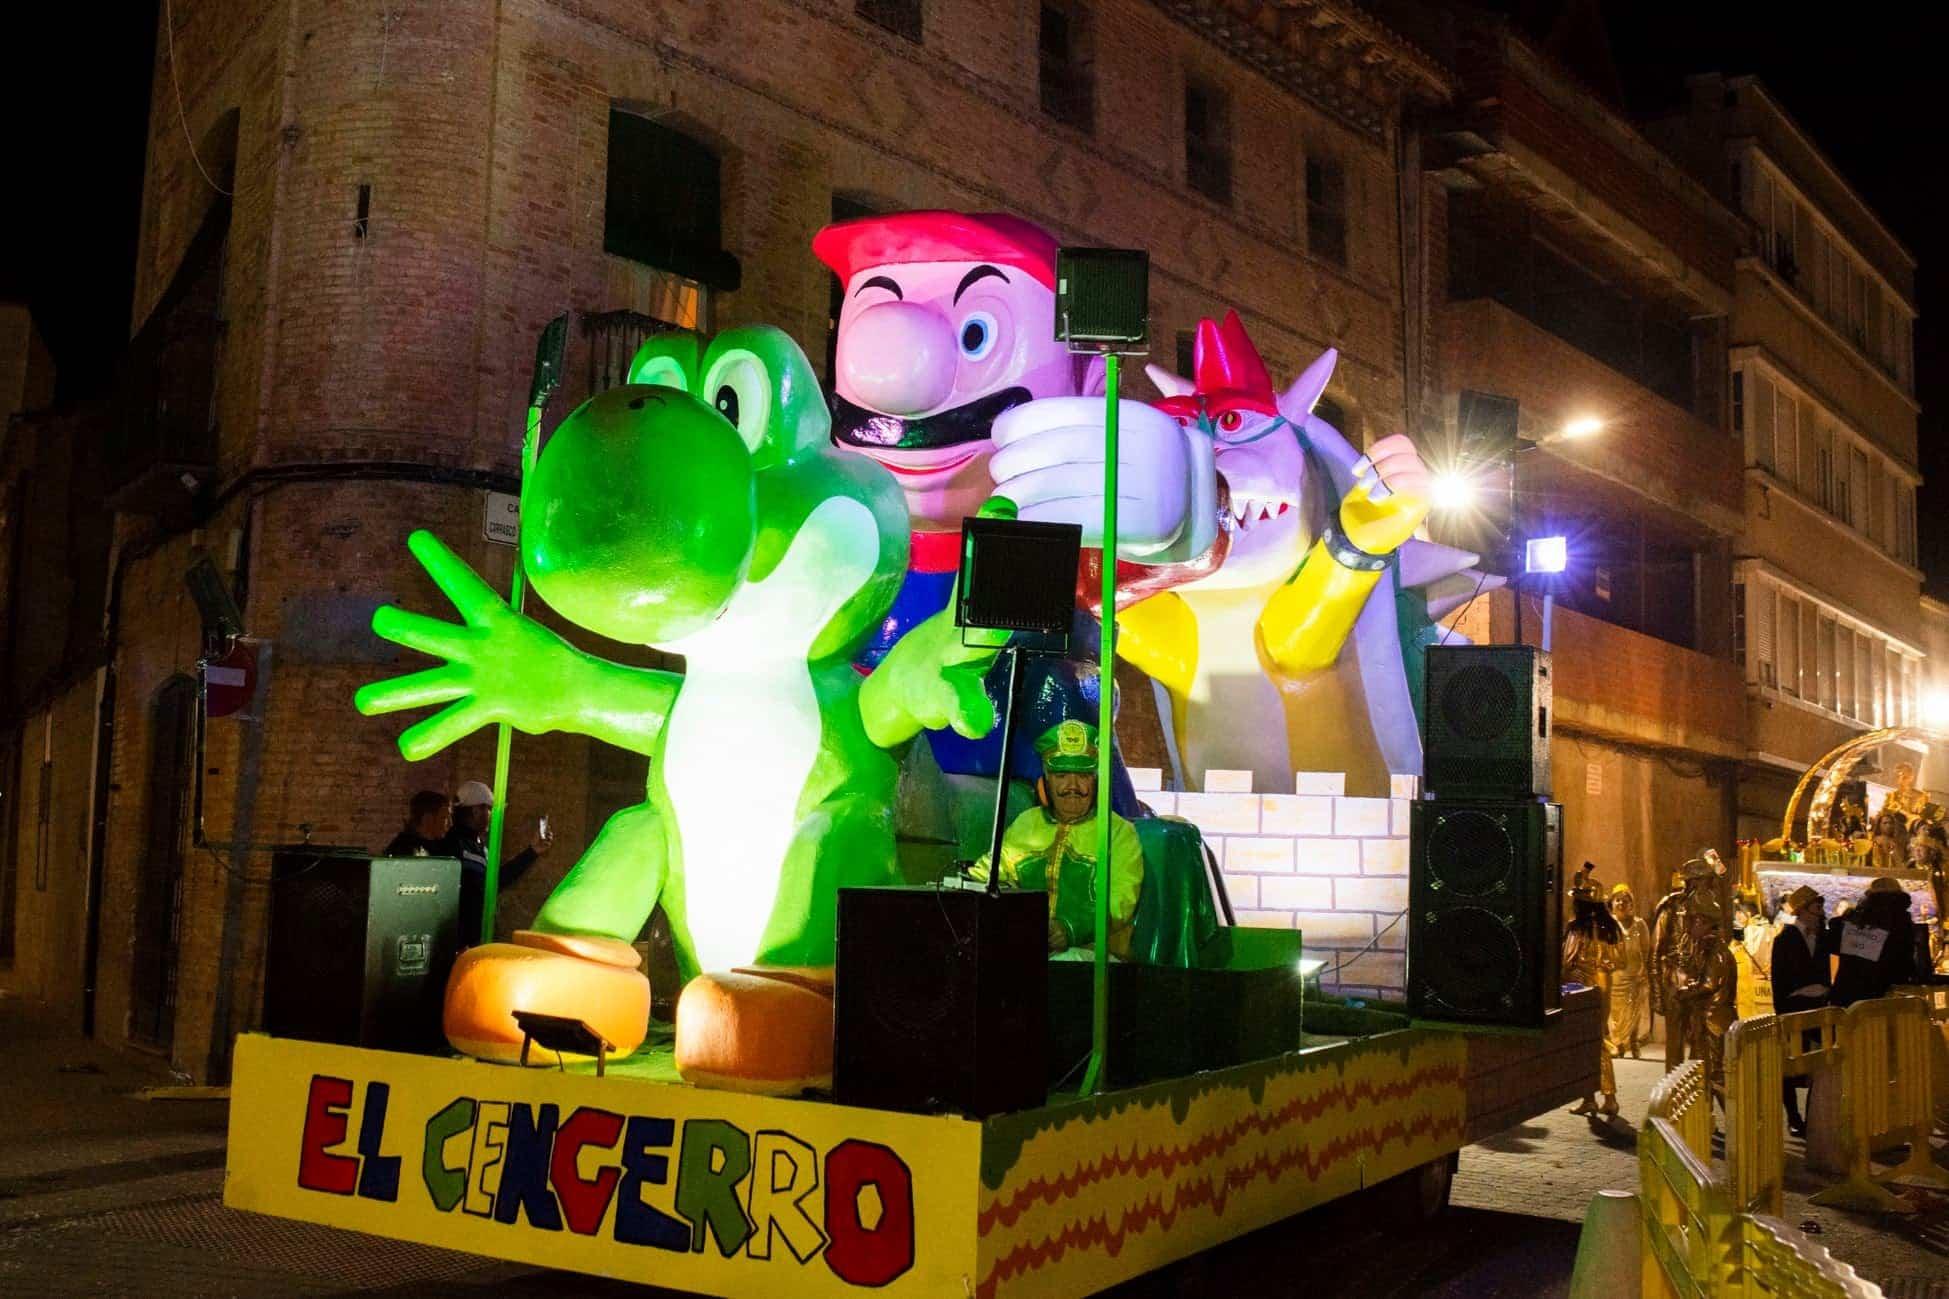 Carnaval de herencia 2020 ofertorio 114 - Selección de fotografías del Ofertorio del Carnaval de Herencia